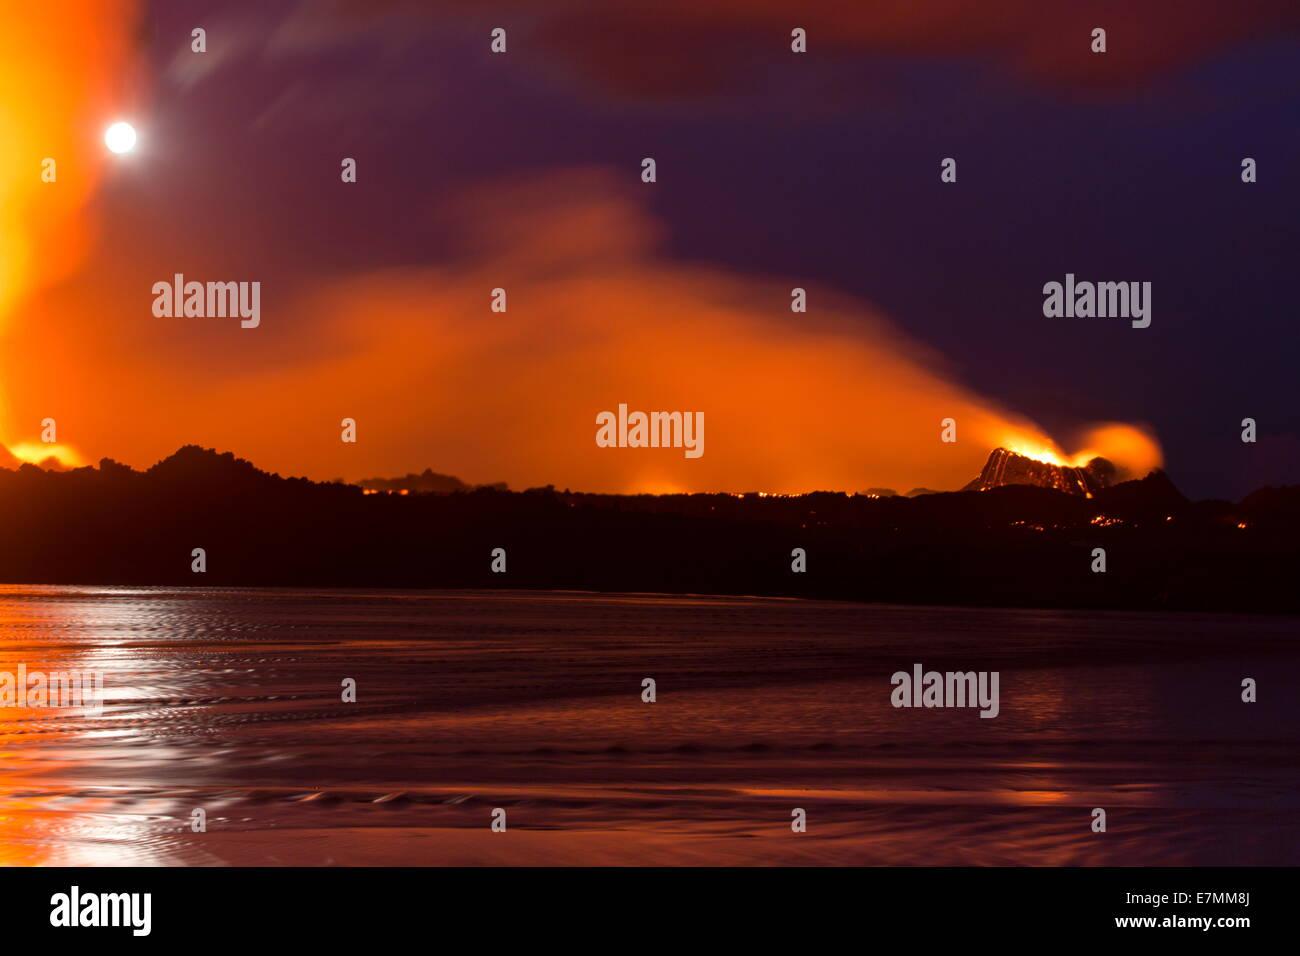 Volcano eruption in Holuhraun, highlands of Iceland - Stock Image